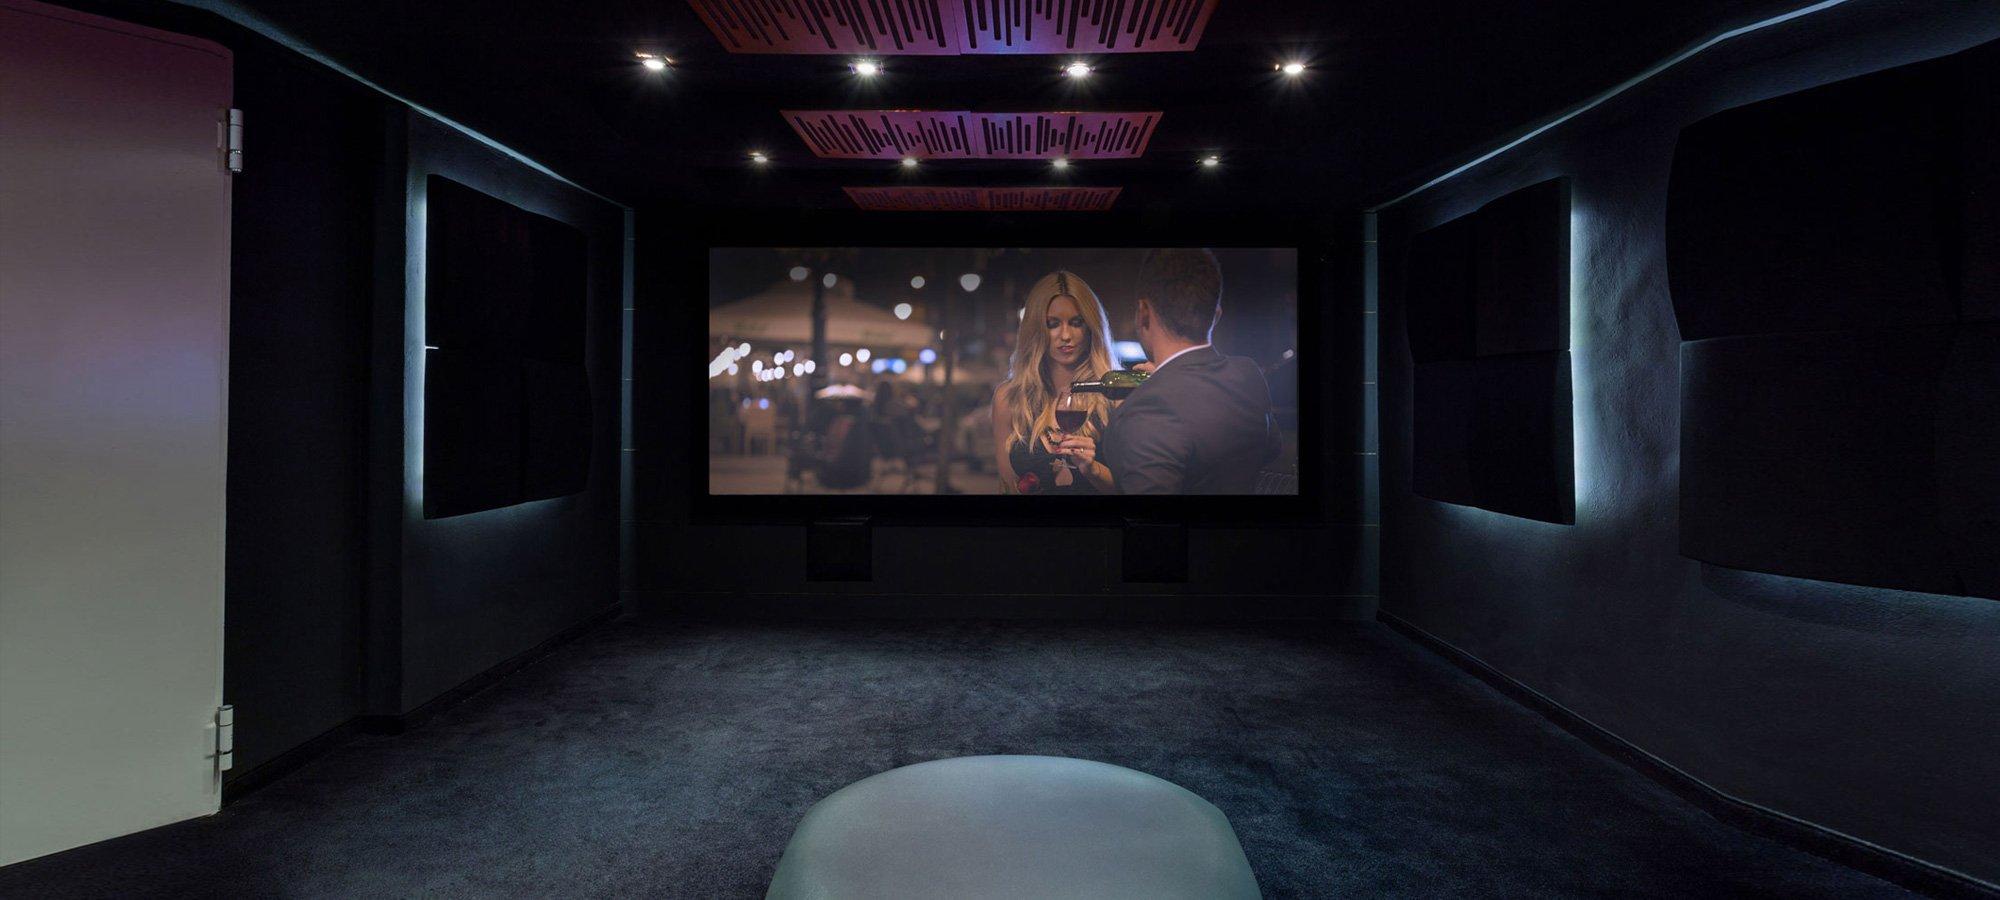 Home-Cinema-design Why 4K UHD Is the Future of Modern Home Cinema Design